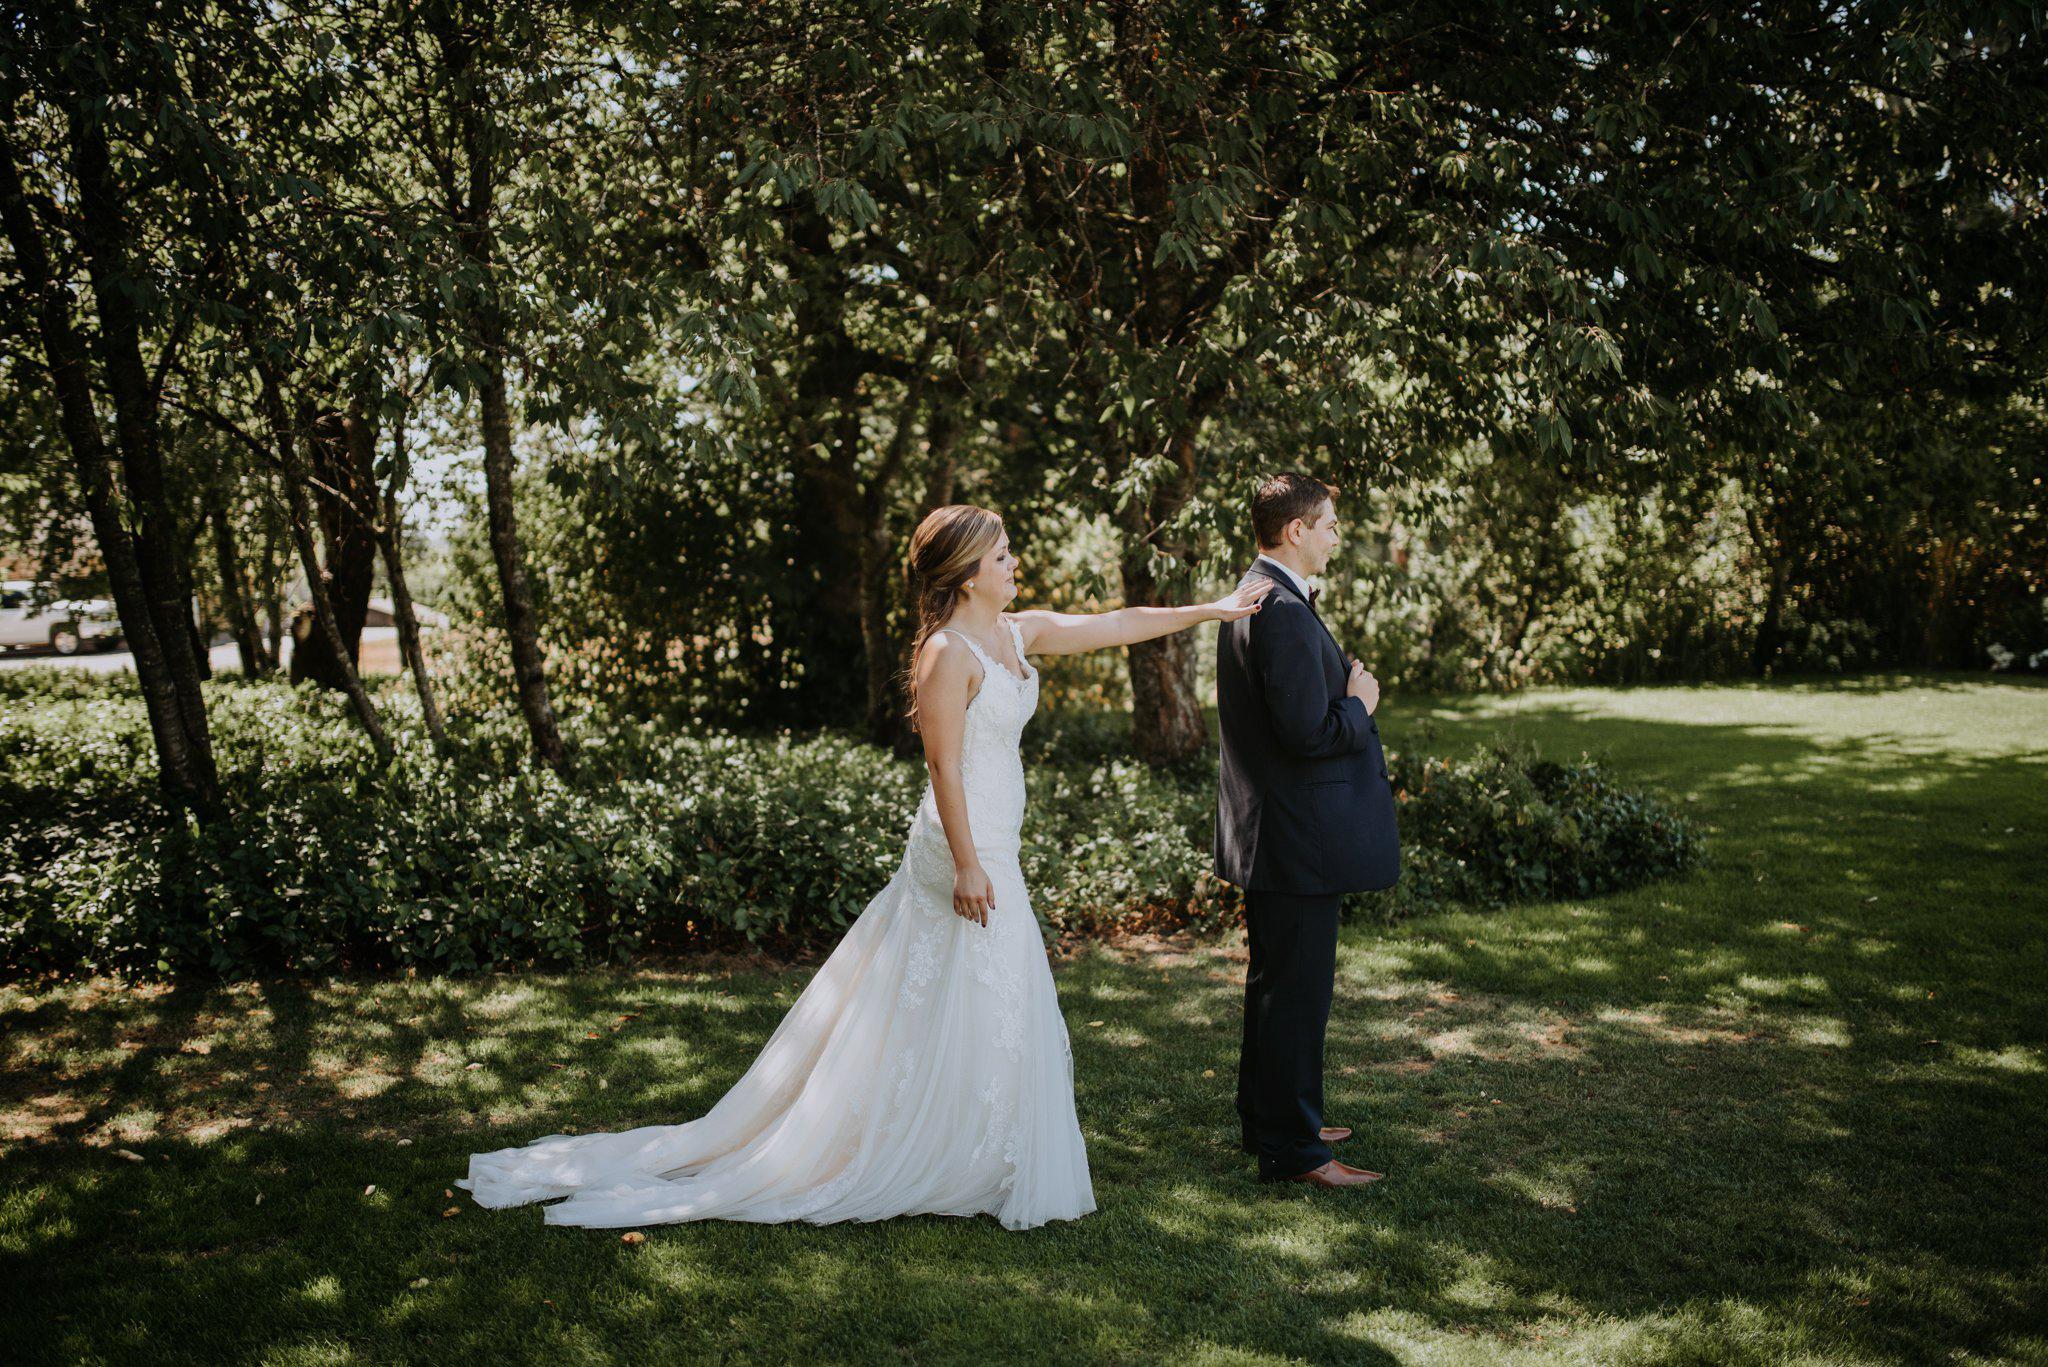 kristen-and-cody-the-kelley-farm-wedding-seattle-photographer-caitlyn-nikula-31.jpg